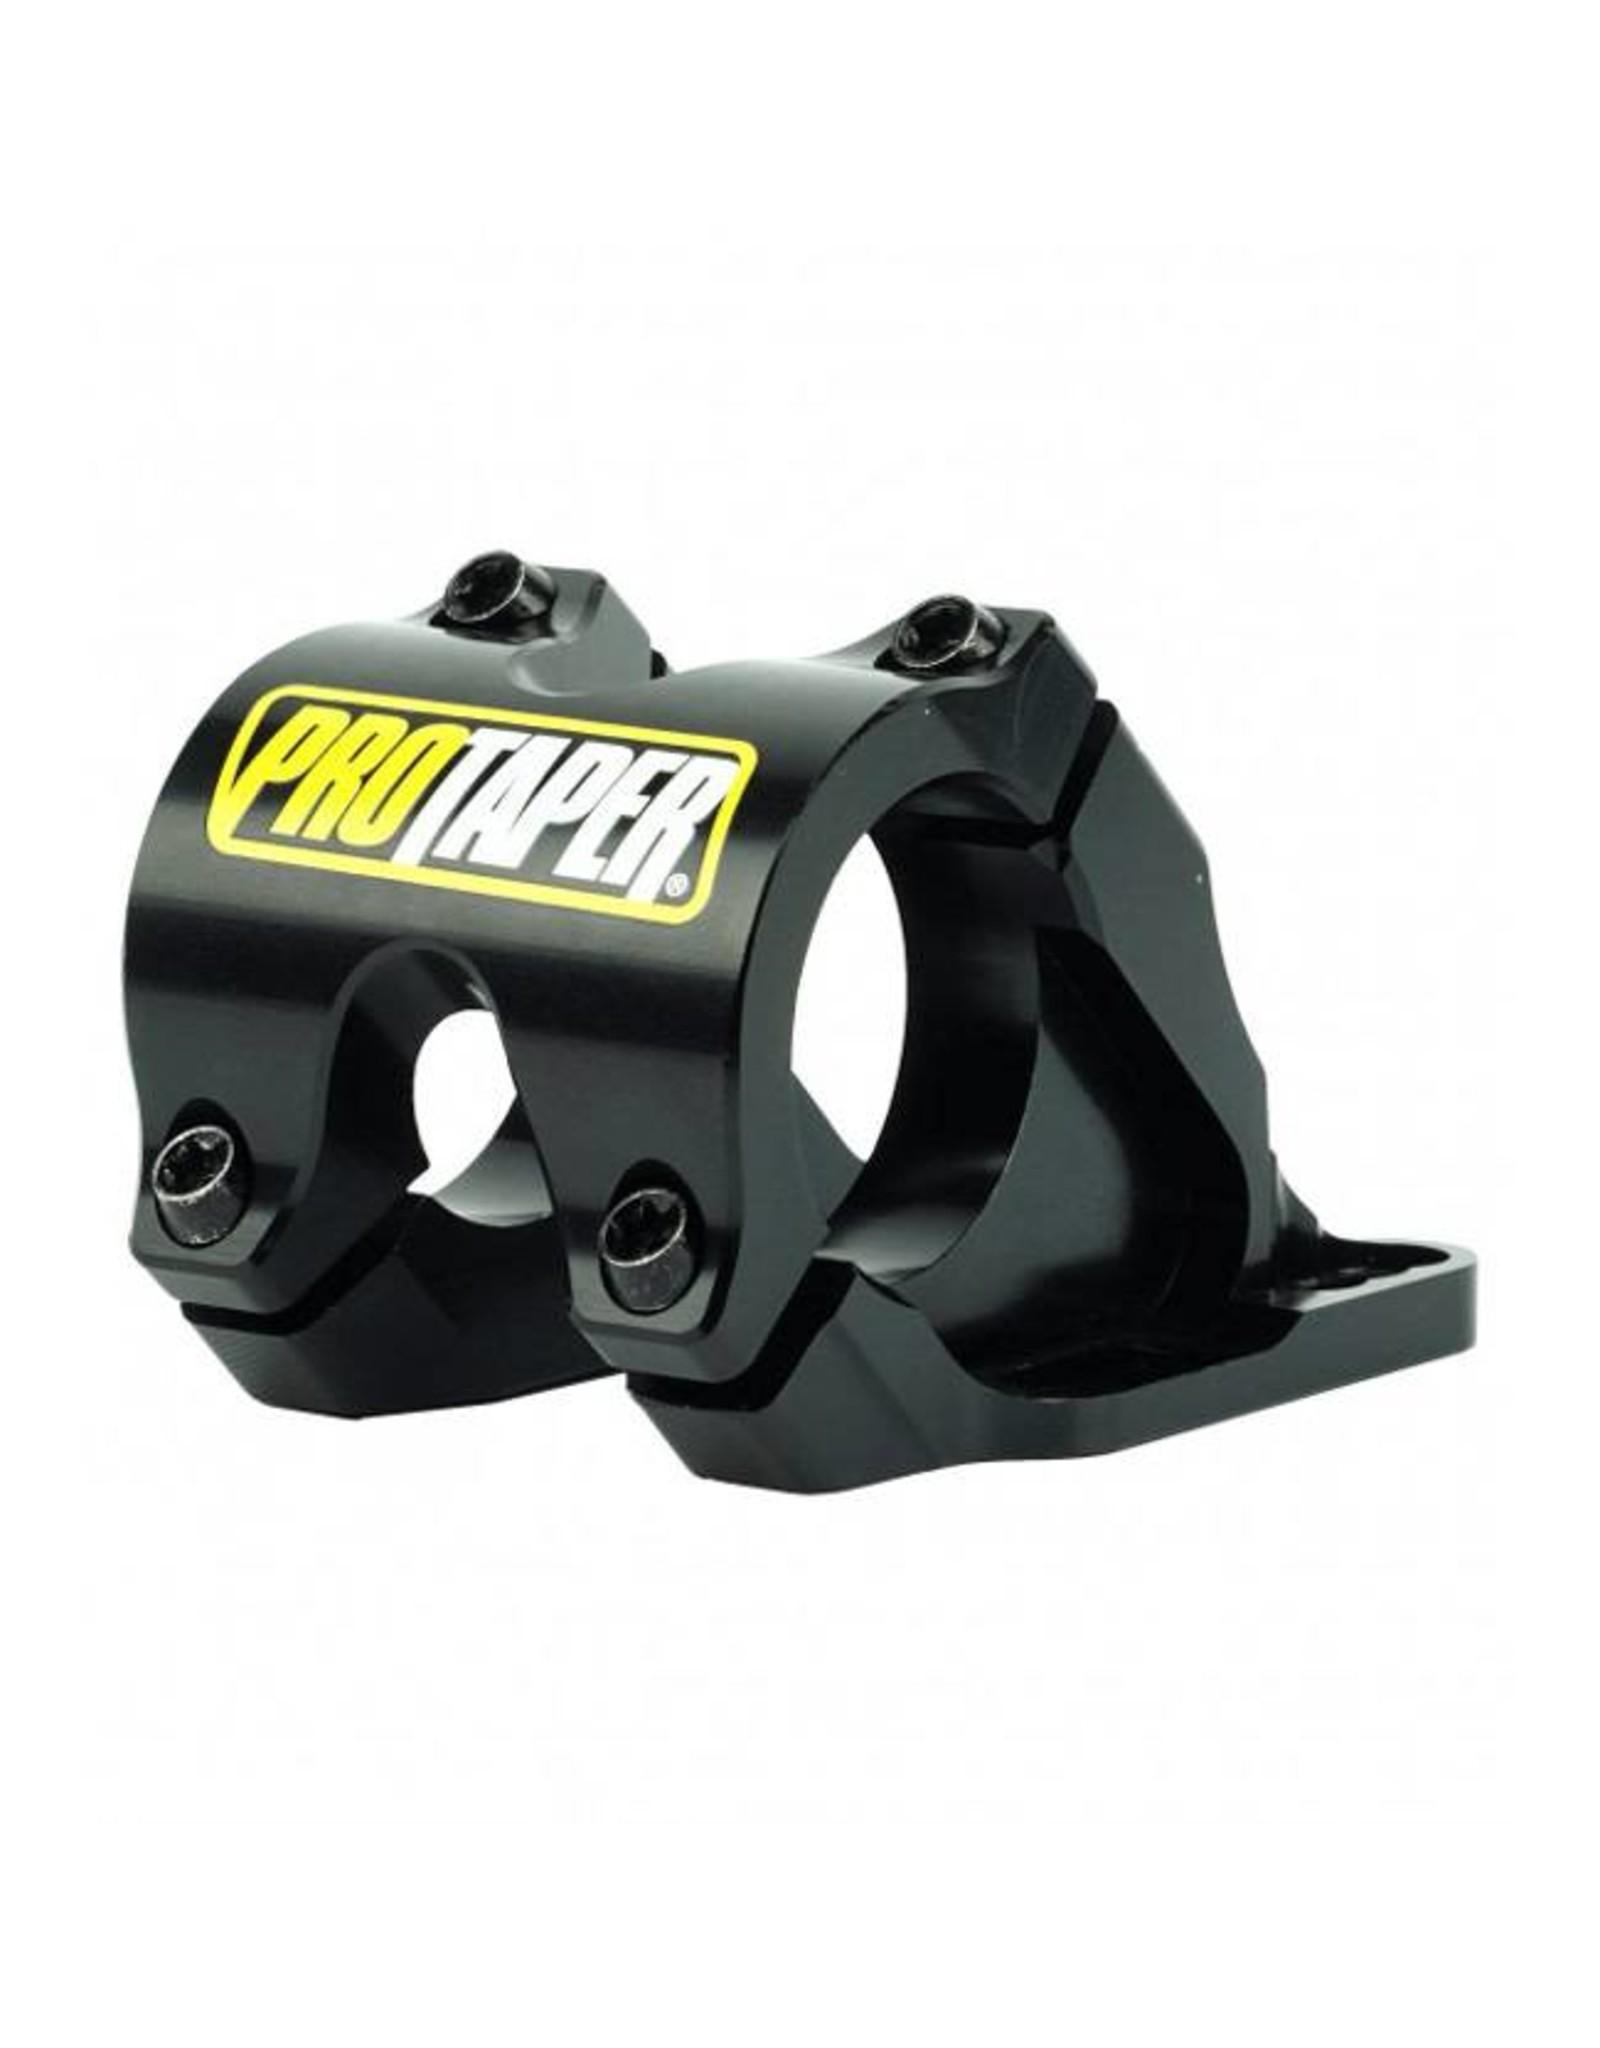 ProTaper ProTaper Direct Mount Stem, 35mm-50mm, 31.8mm Bar Clamp, Black